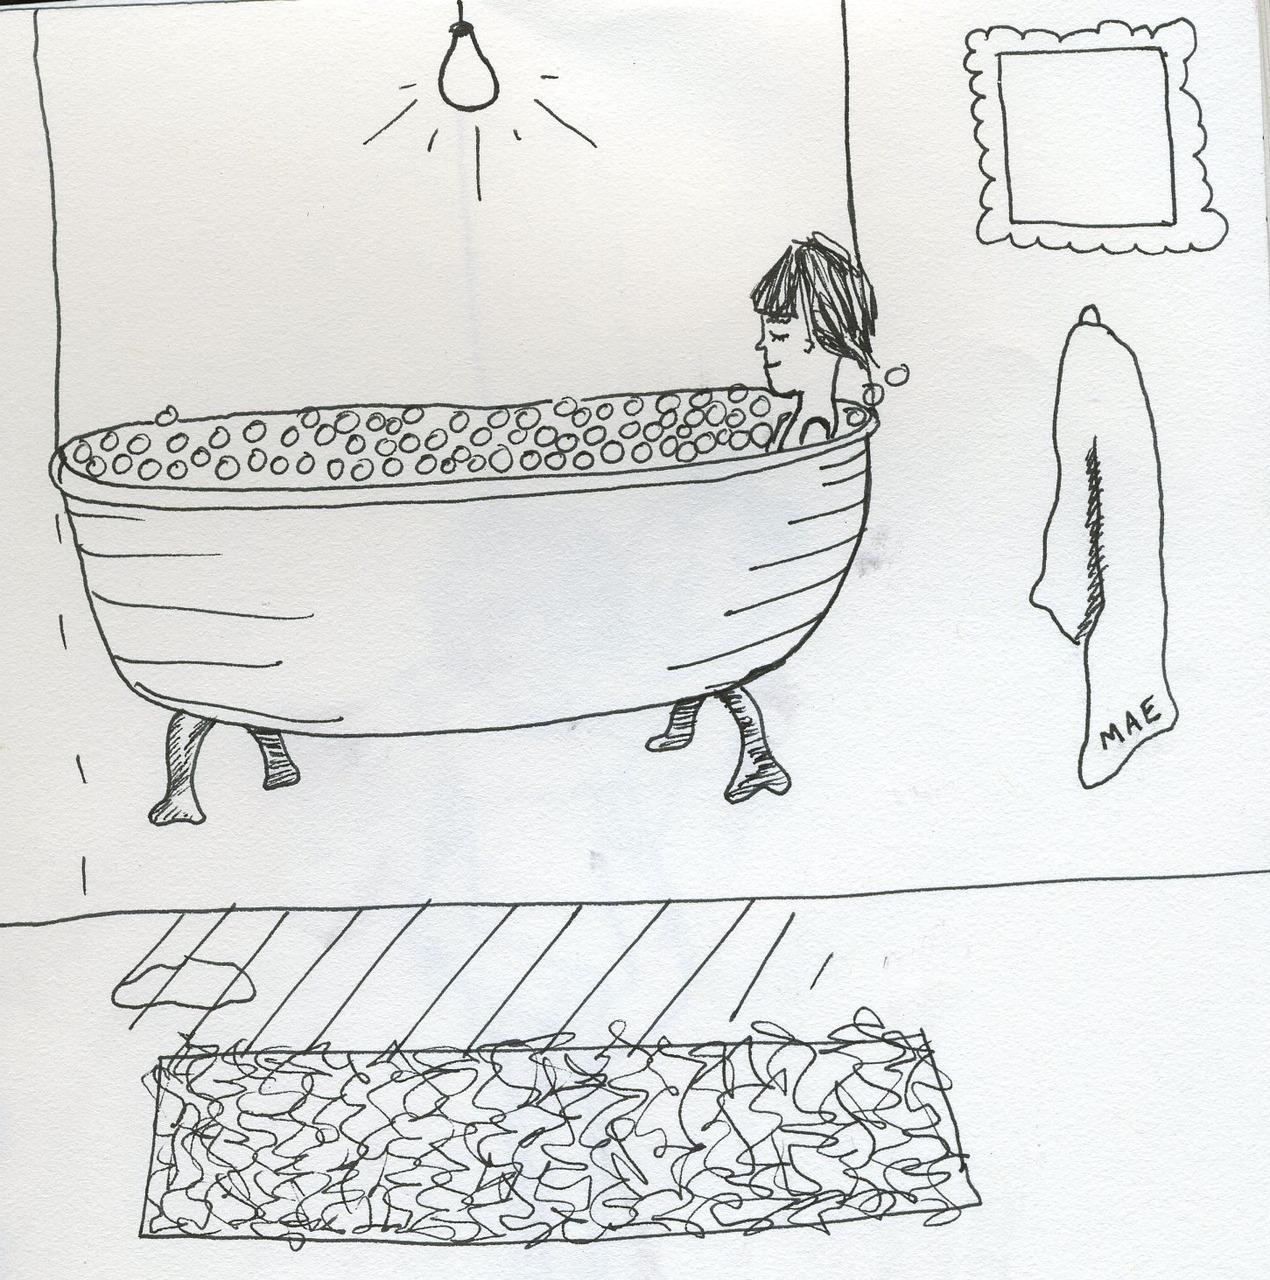 i think an elevated bathtub is a super idea